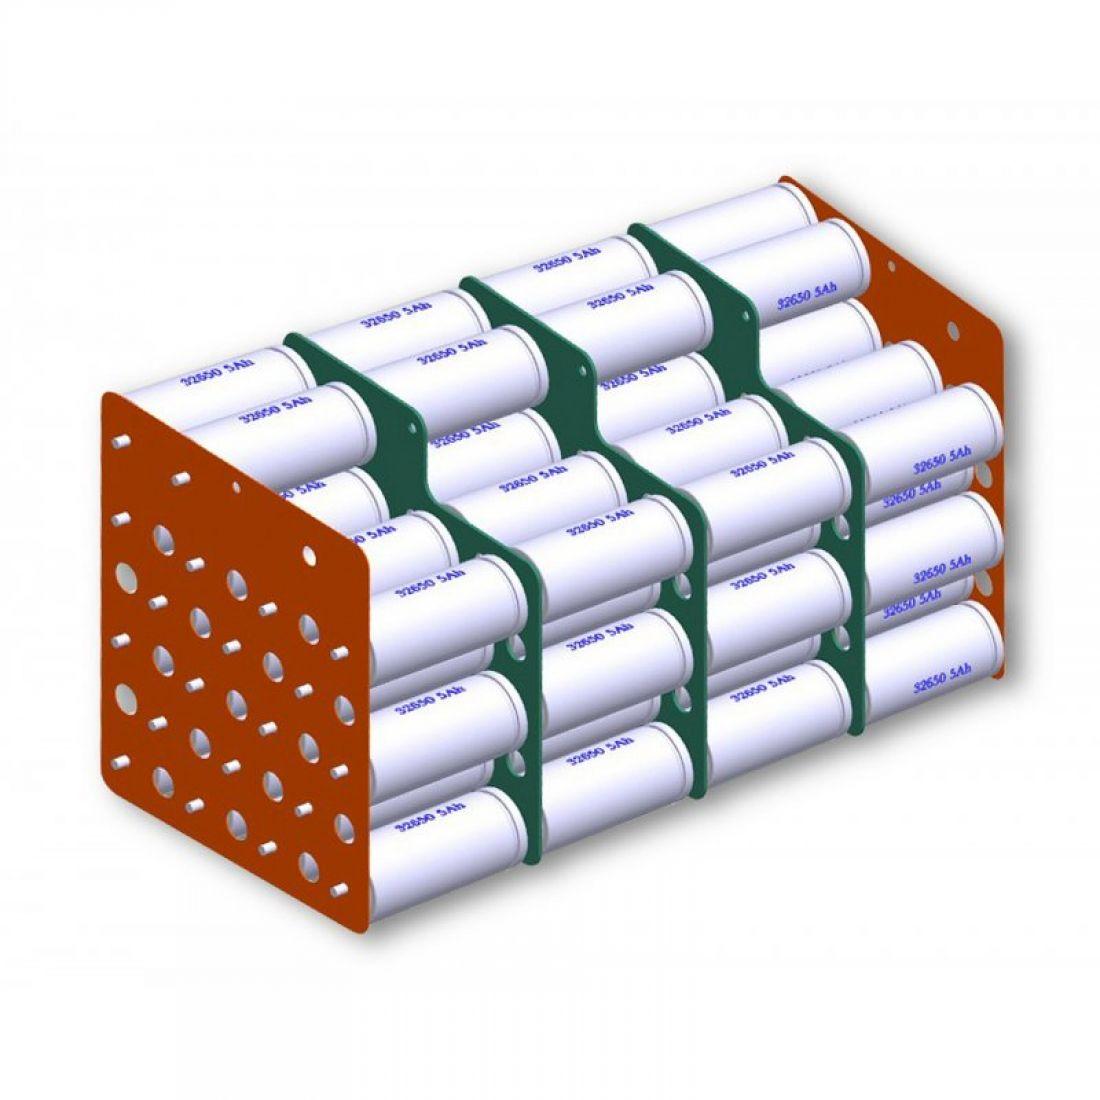 lithium ionen akku 100 ah typ lmp 12 100 1280 wh. Black Bedroom Furniture Sets. Home Design Ideas